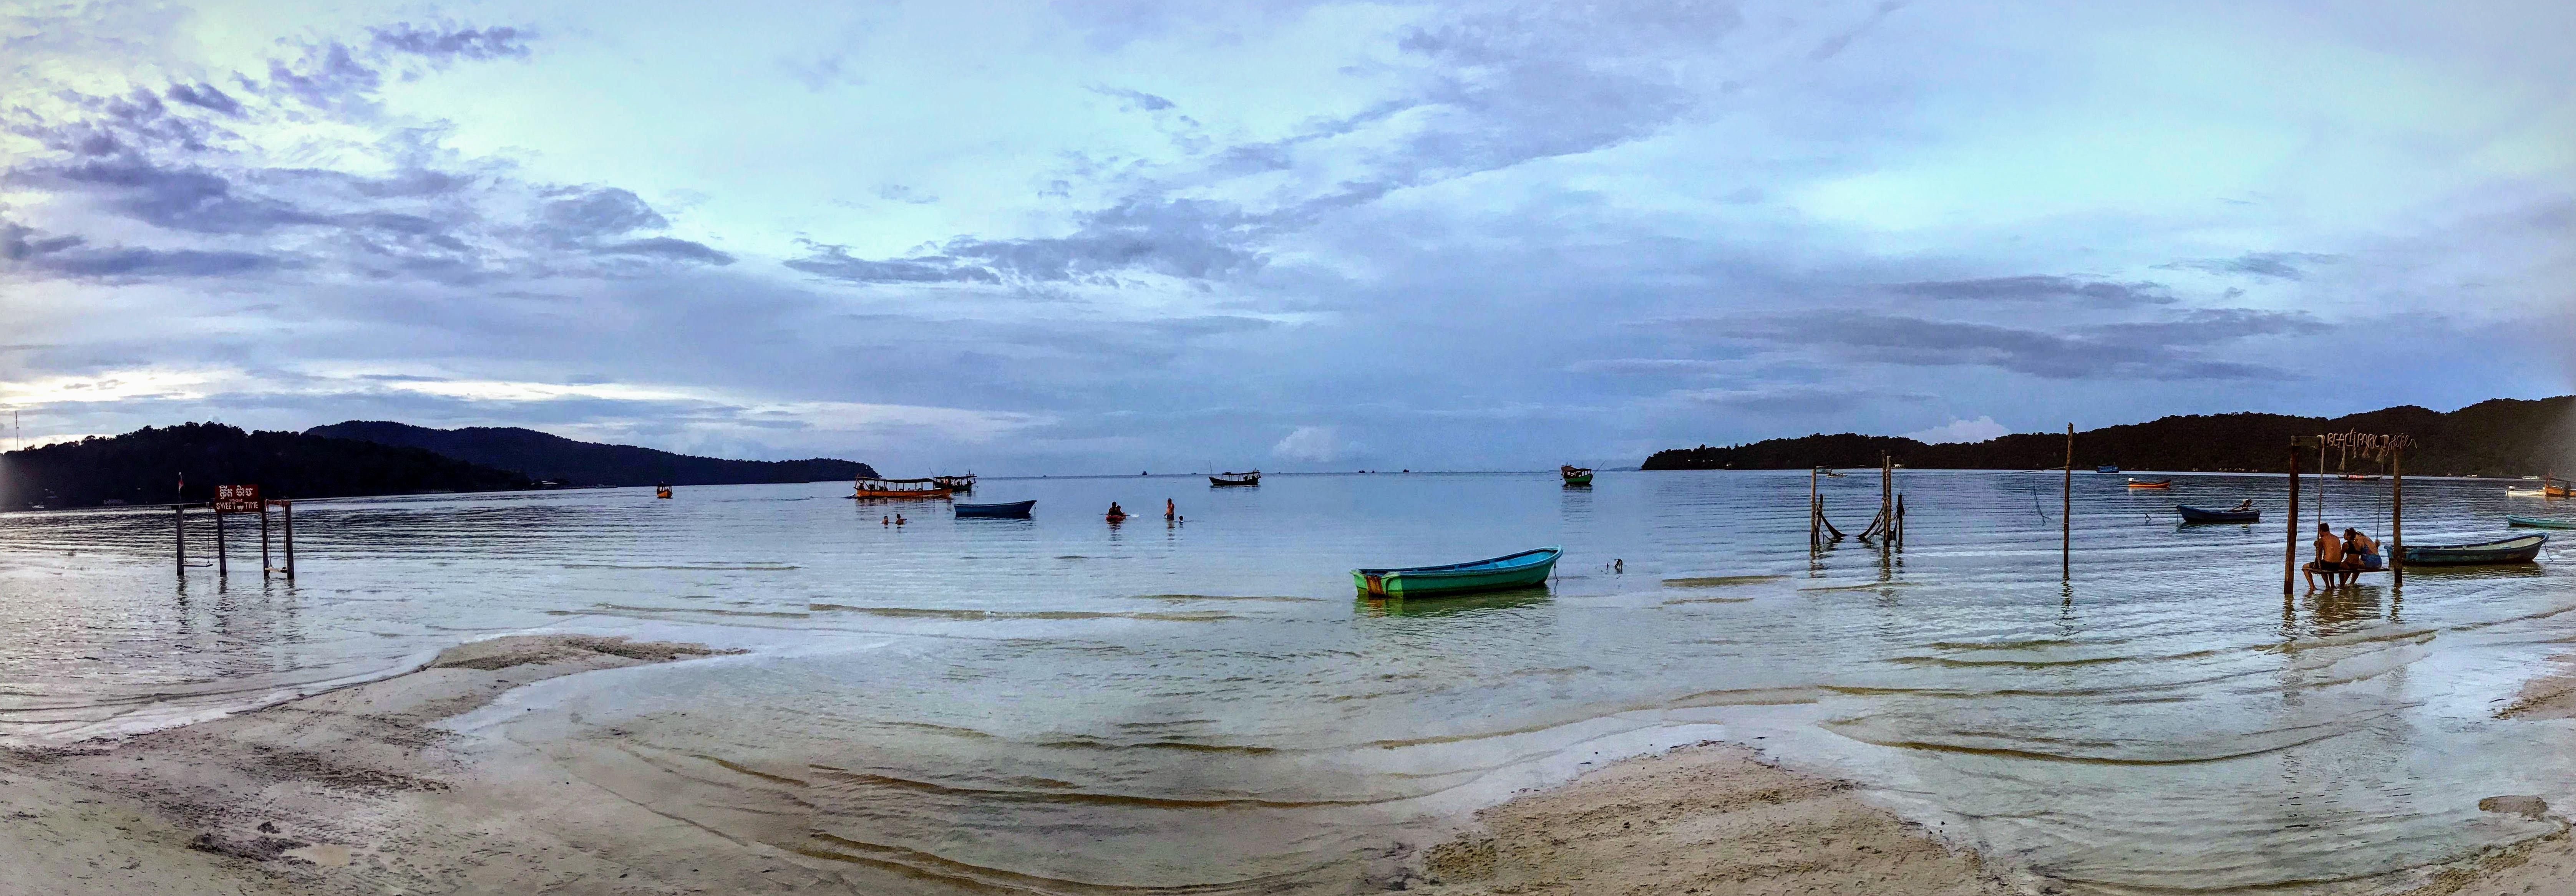 Saracen Beach, Koh Rong Samloem, Cambodia